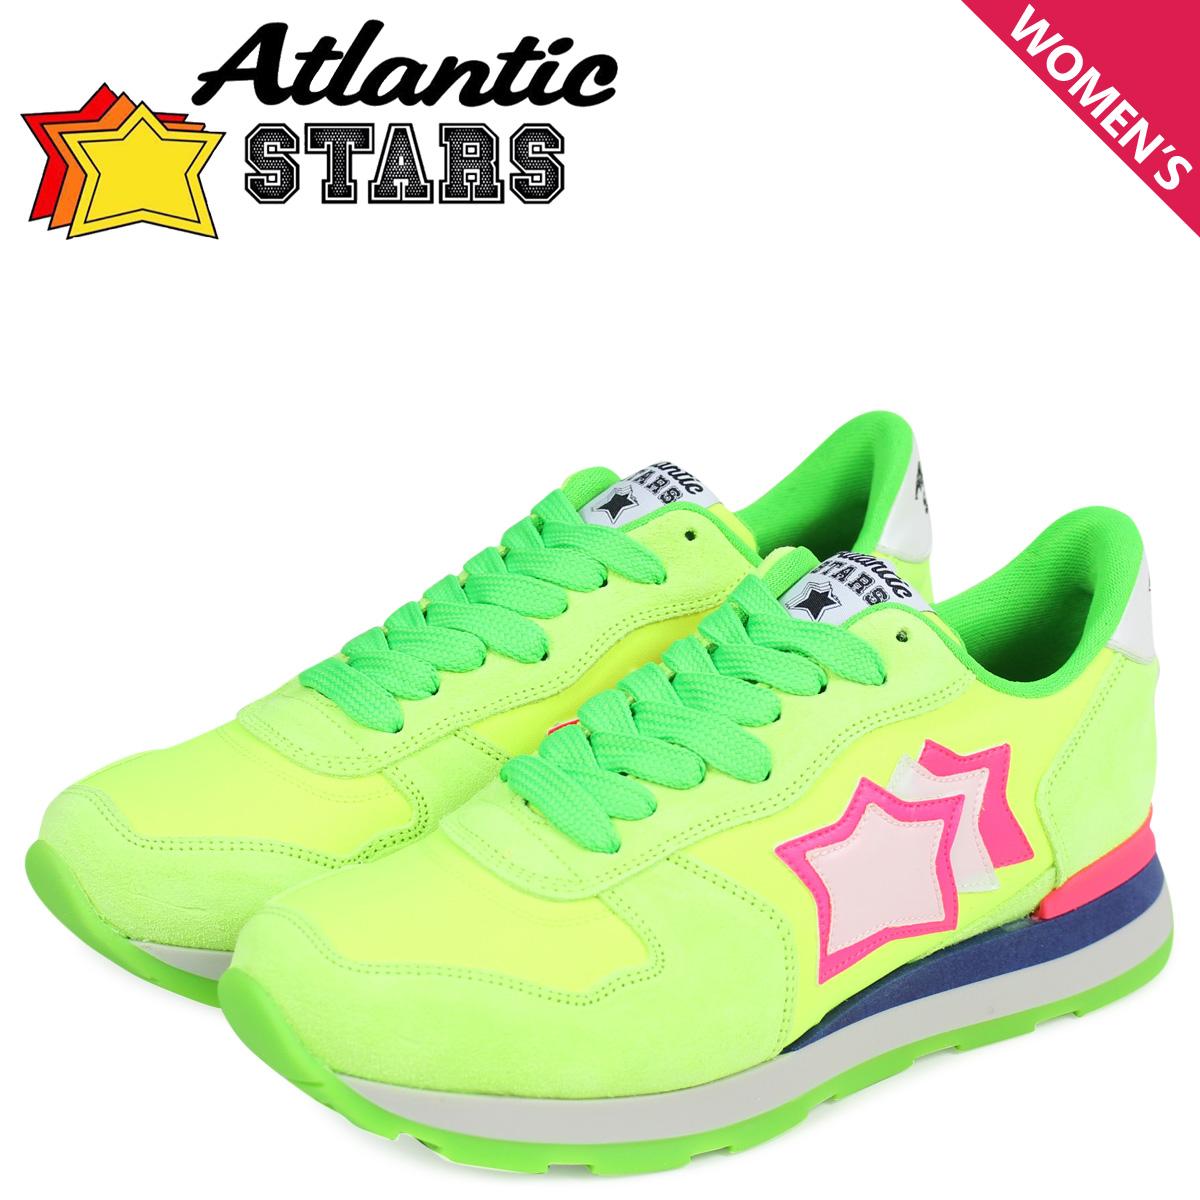 Atlantic STARS アトランティックスターズ スニーカー レディース ベガ VEGA グリーン UVS-87FF